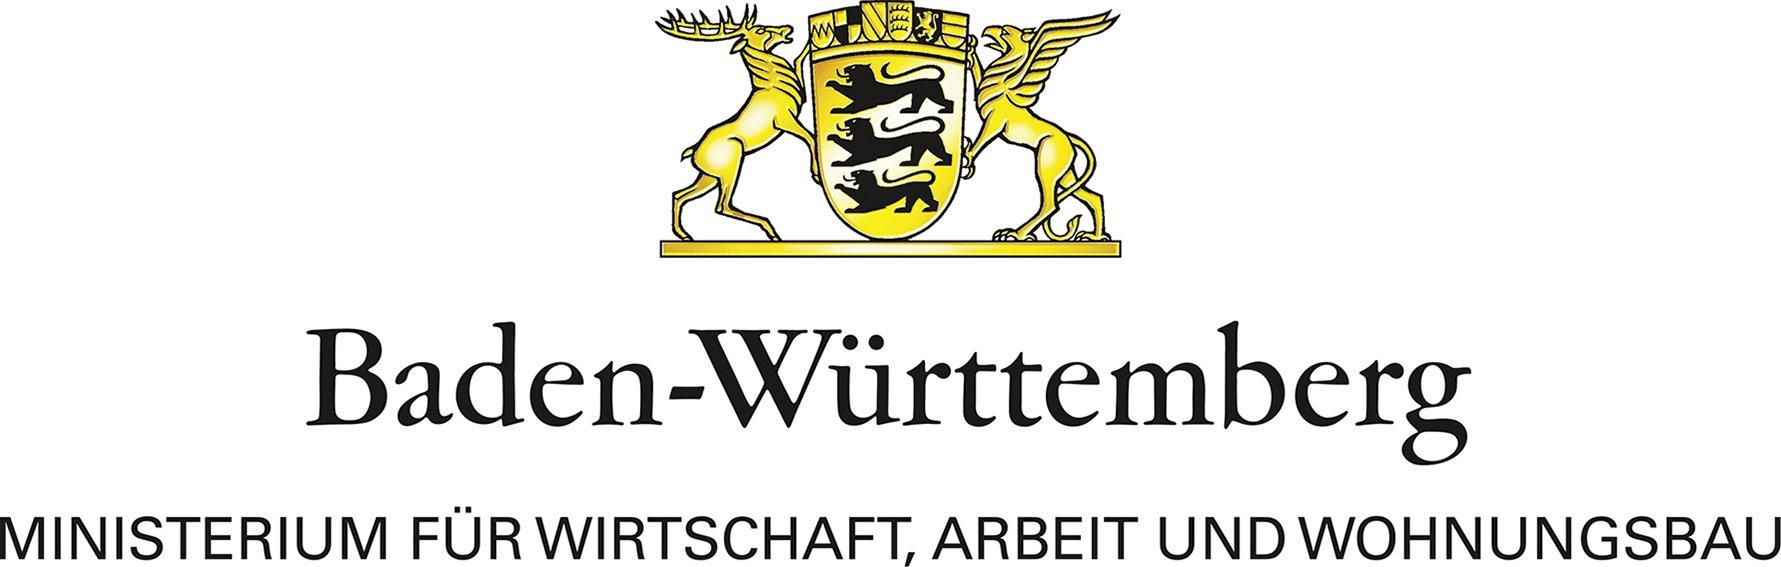 logo_Ministerium_MWAW